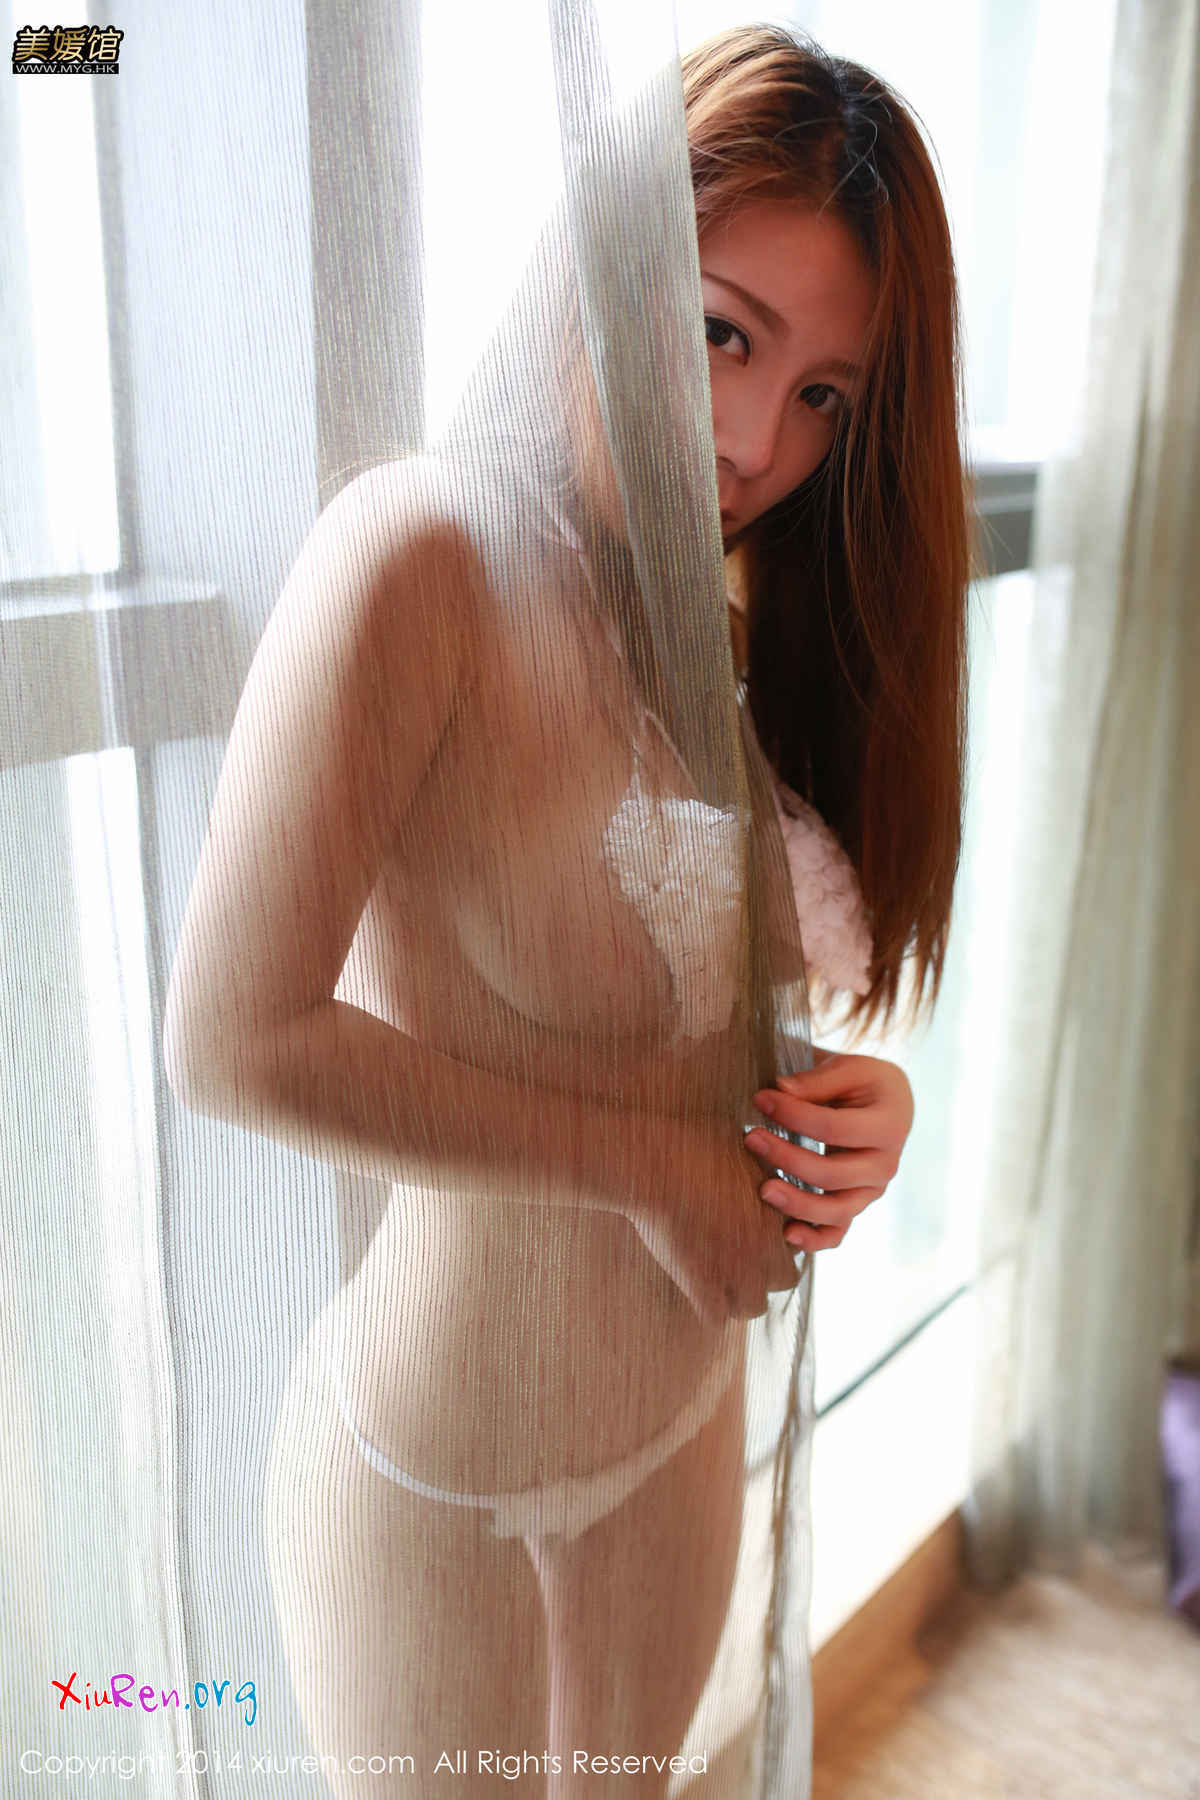 phimvu blog-XiuRen-N00124-vetiver-0046.jpg